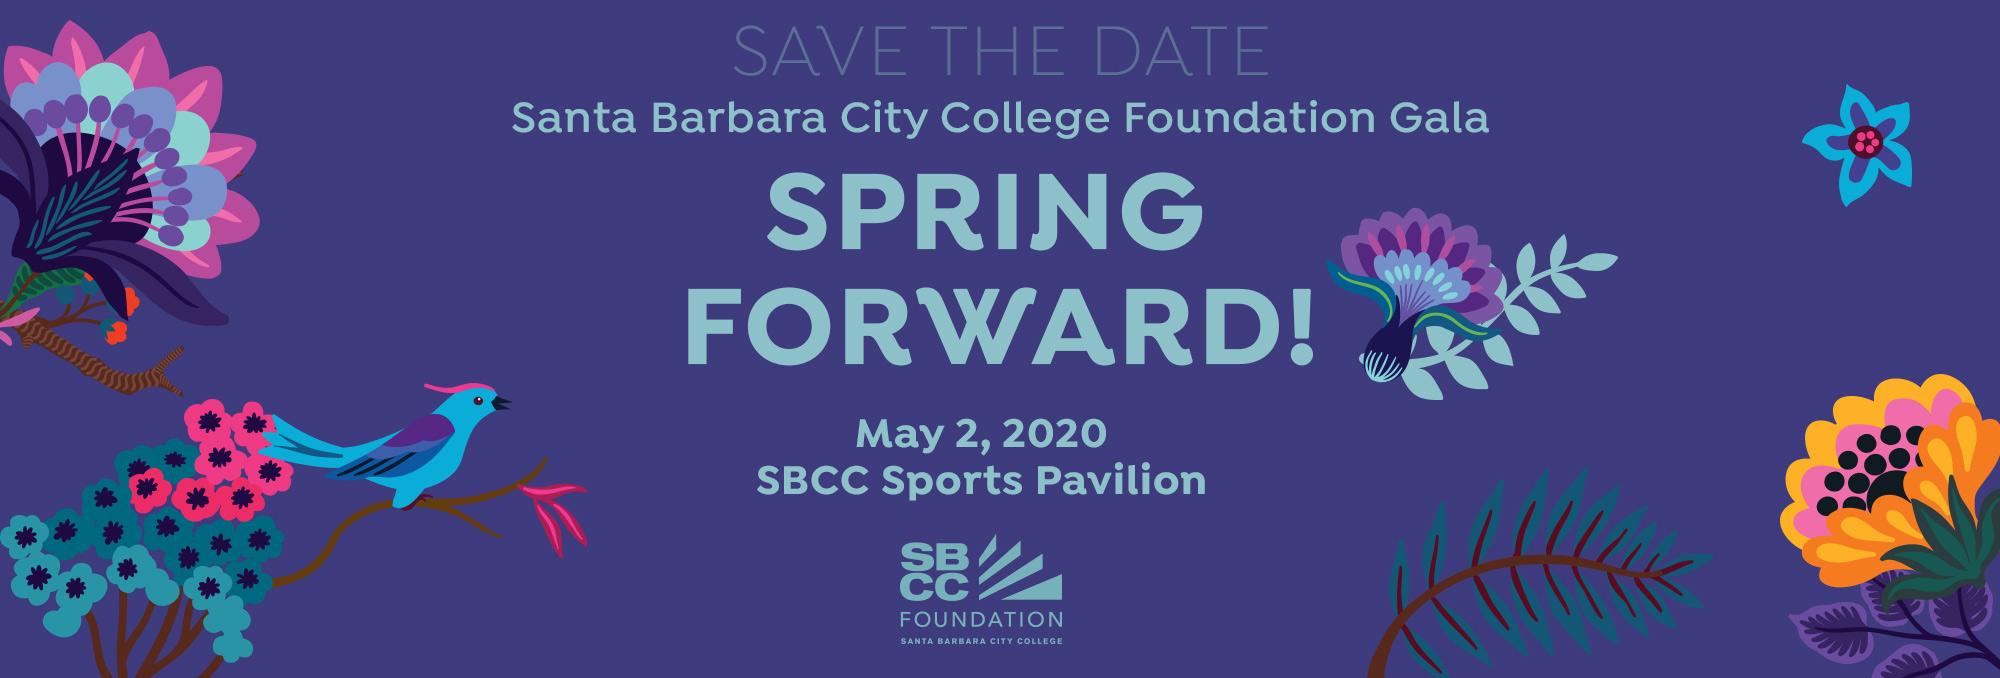 Santa Monica College Spring 2020.Sbcc Foundation